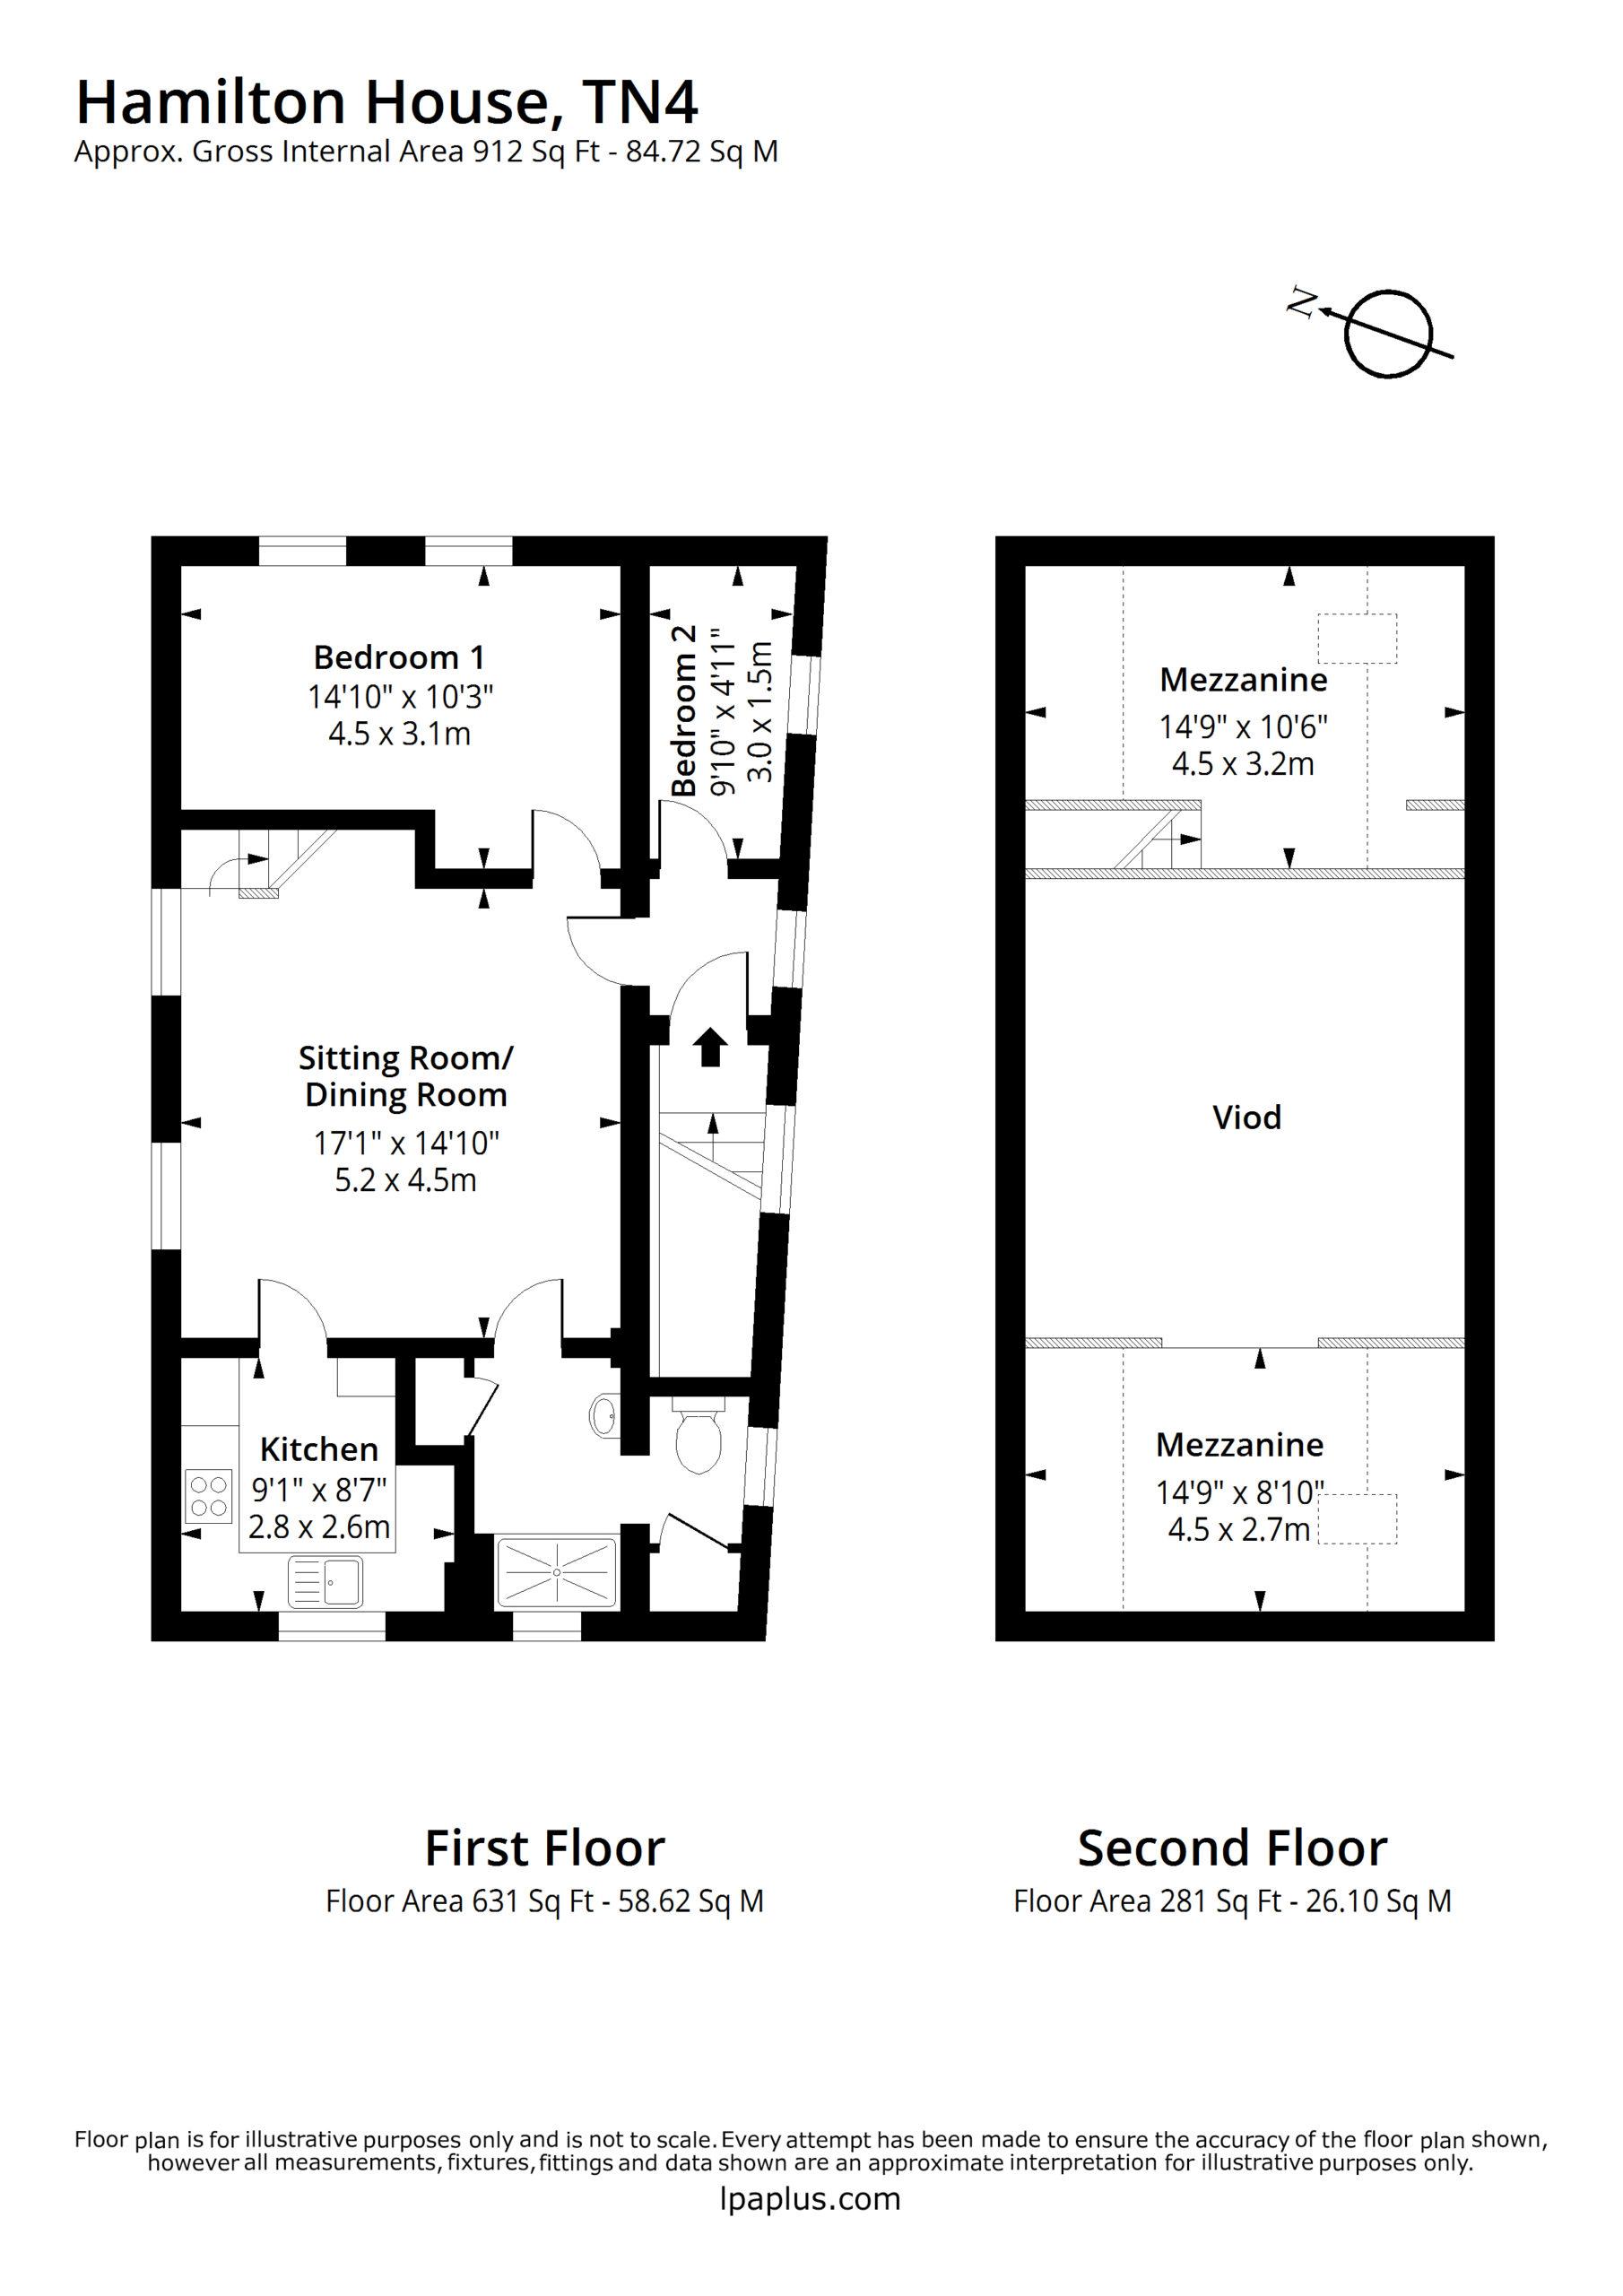 hamilton house tunbridge wells floor plan